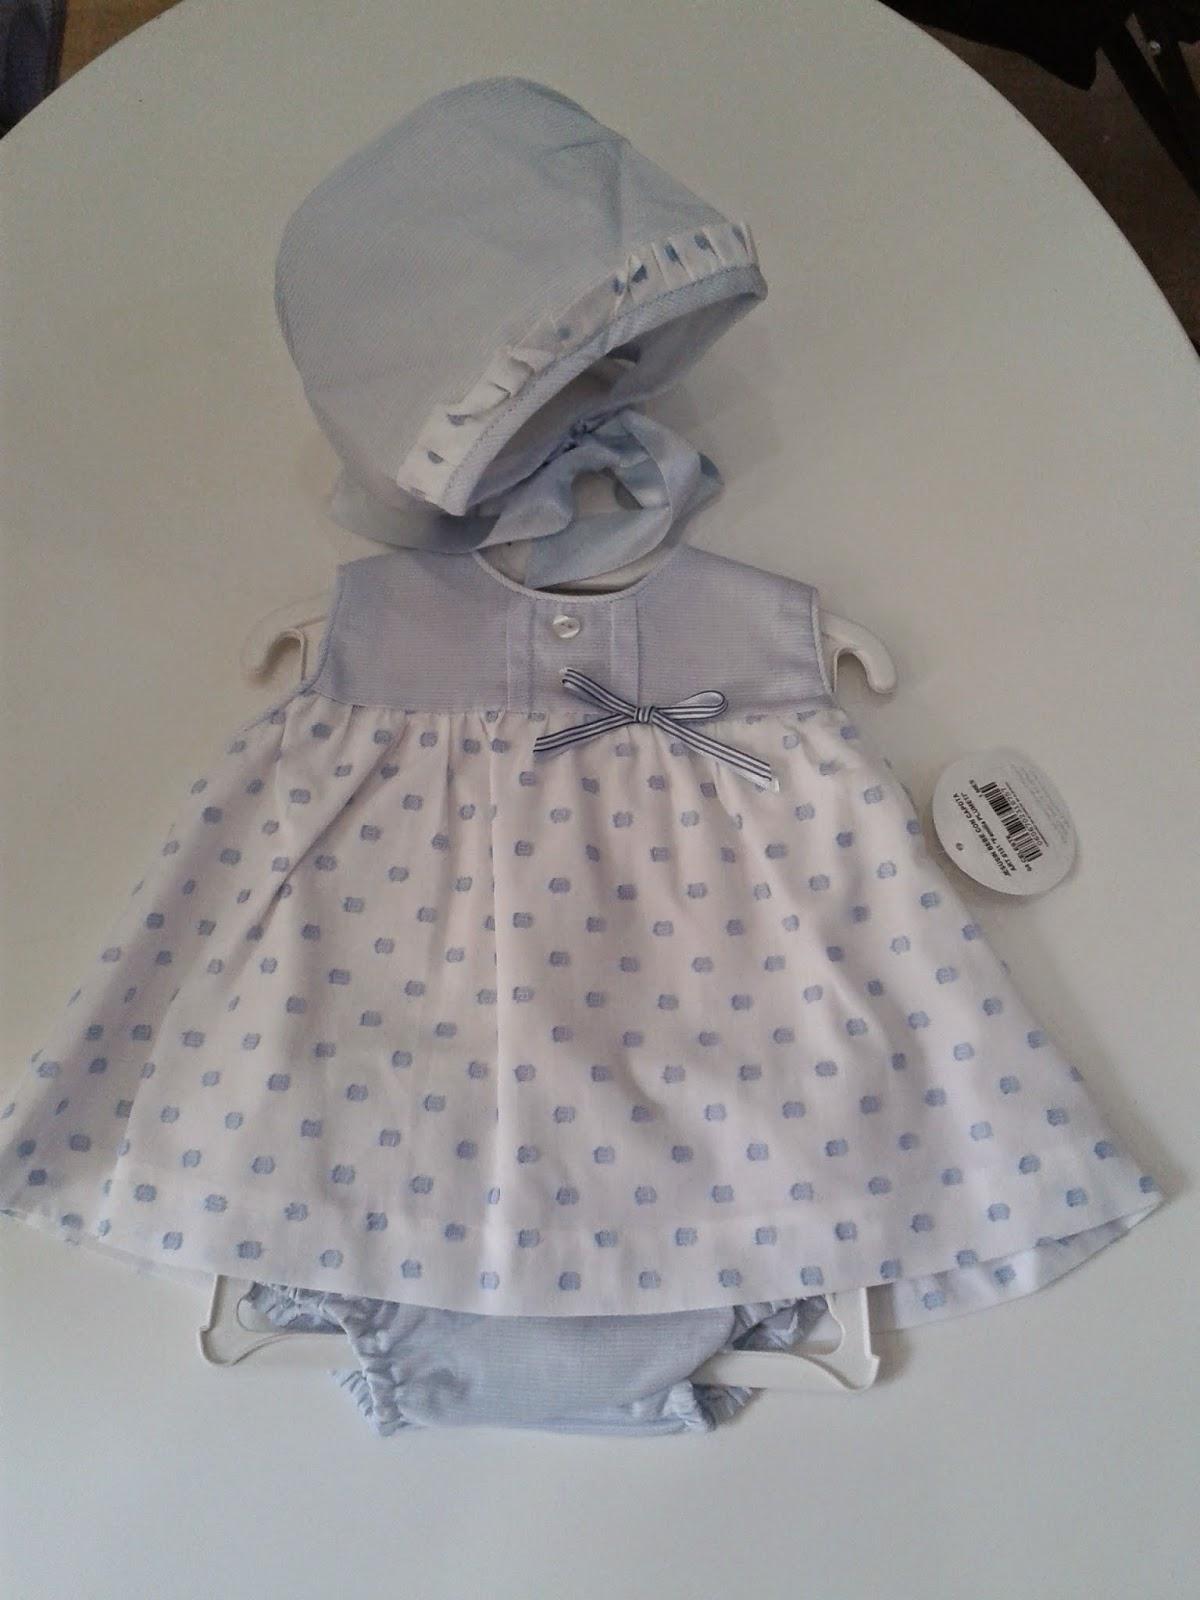 Lazos beb s ropa beb 0 12 meses paz rodr guez yoedu - Ropa bebe nino 0 meses ...